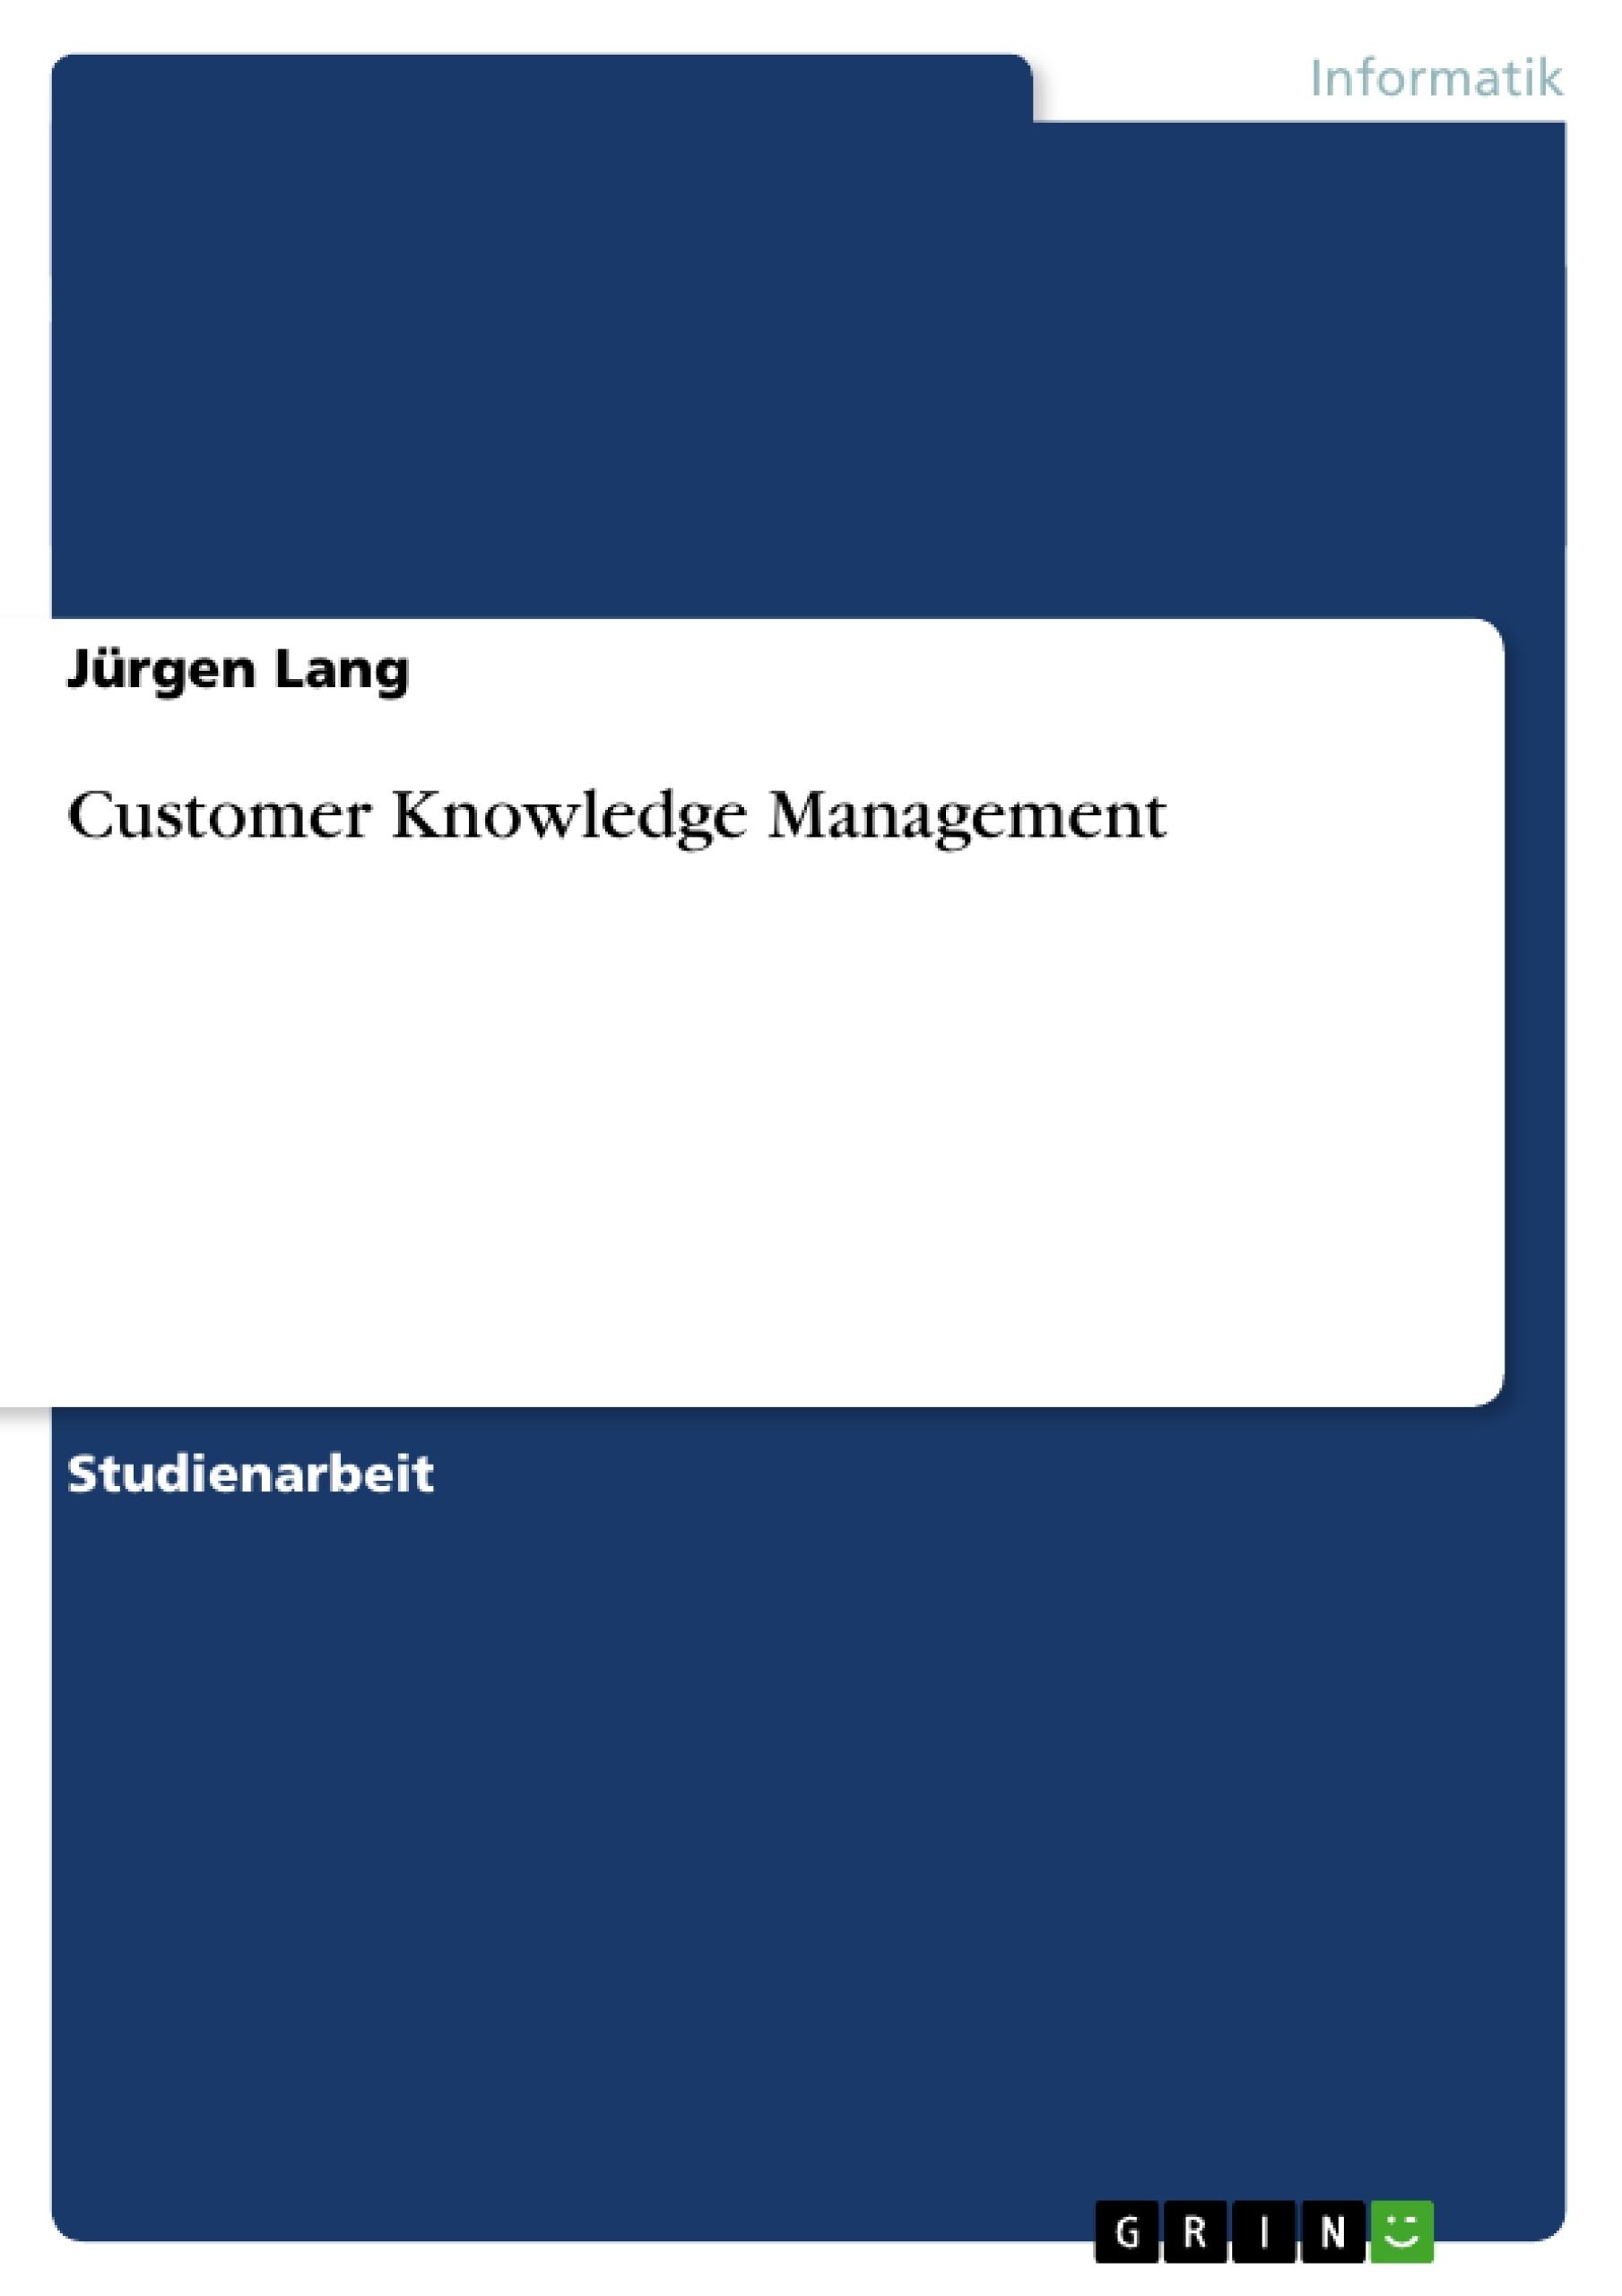 Titel: Customer Knowledge Management